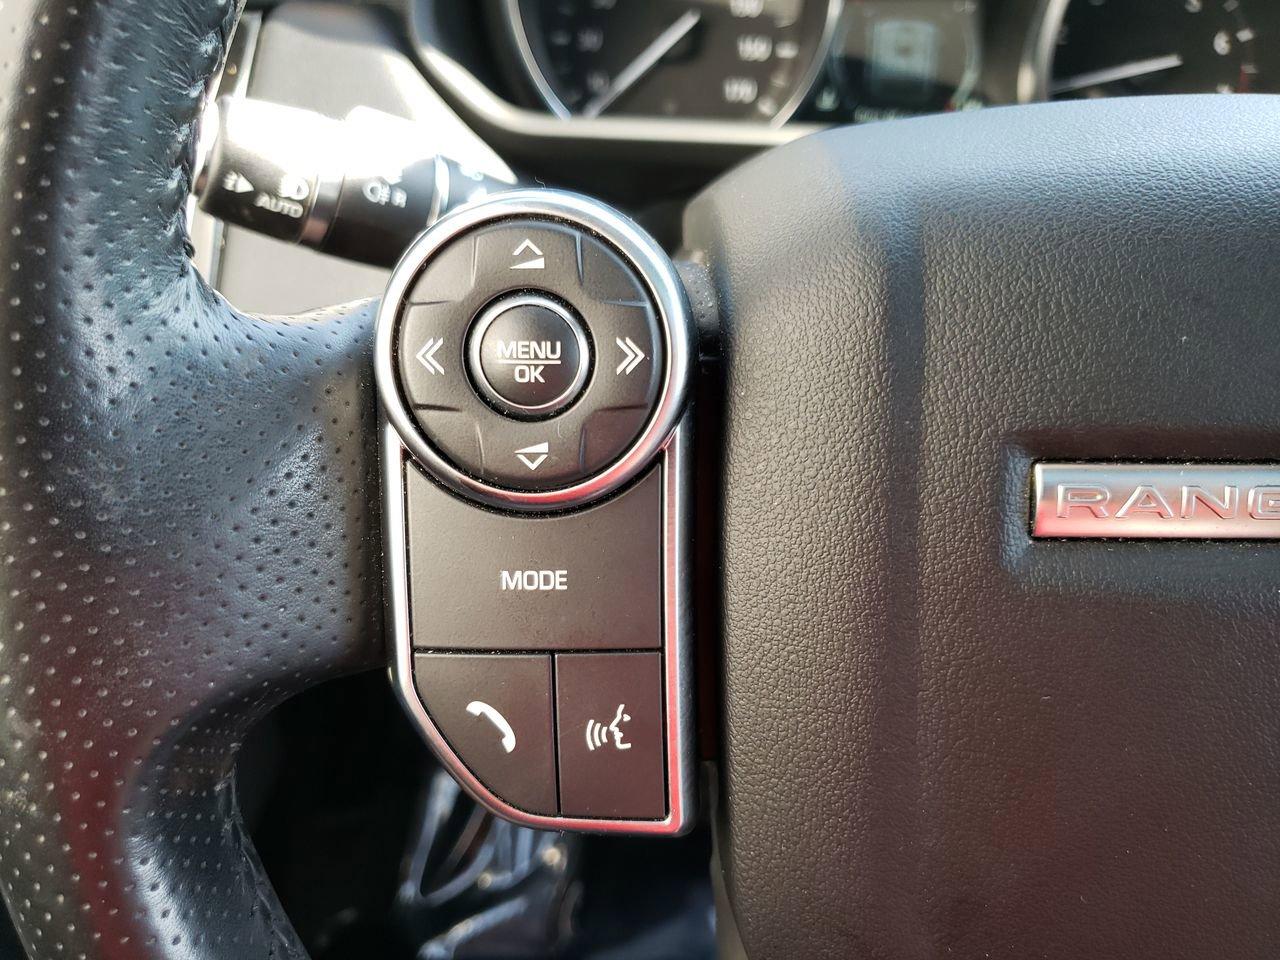 Pre-Owned 2016 Land Rover Range Rover Sport V6 HSE